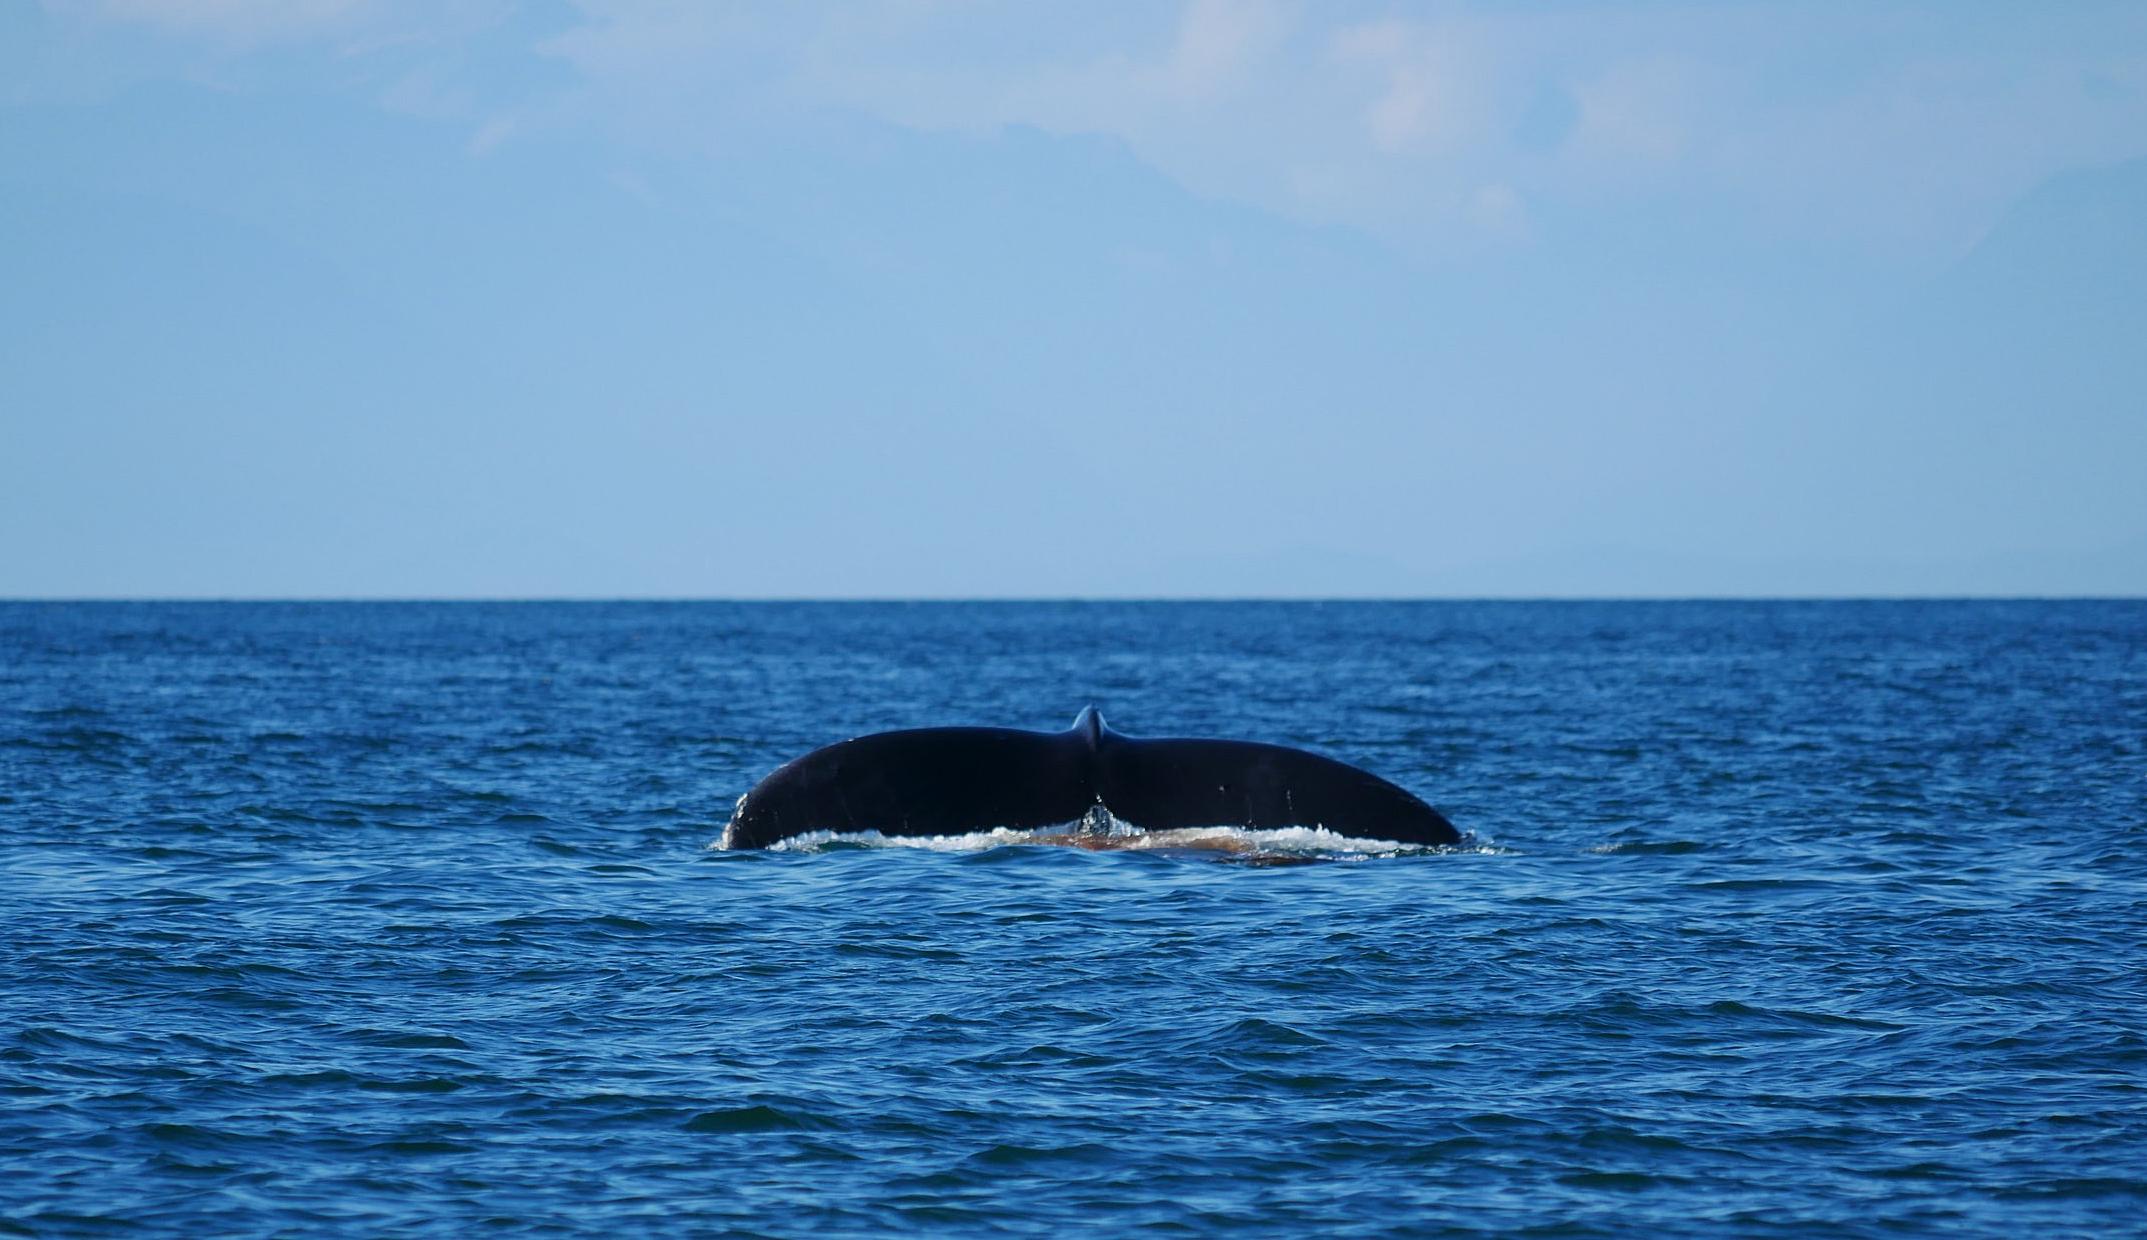 Humpback whale poo from Raptor! Photo by Rodrigo Menezes